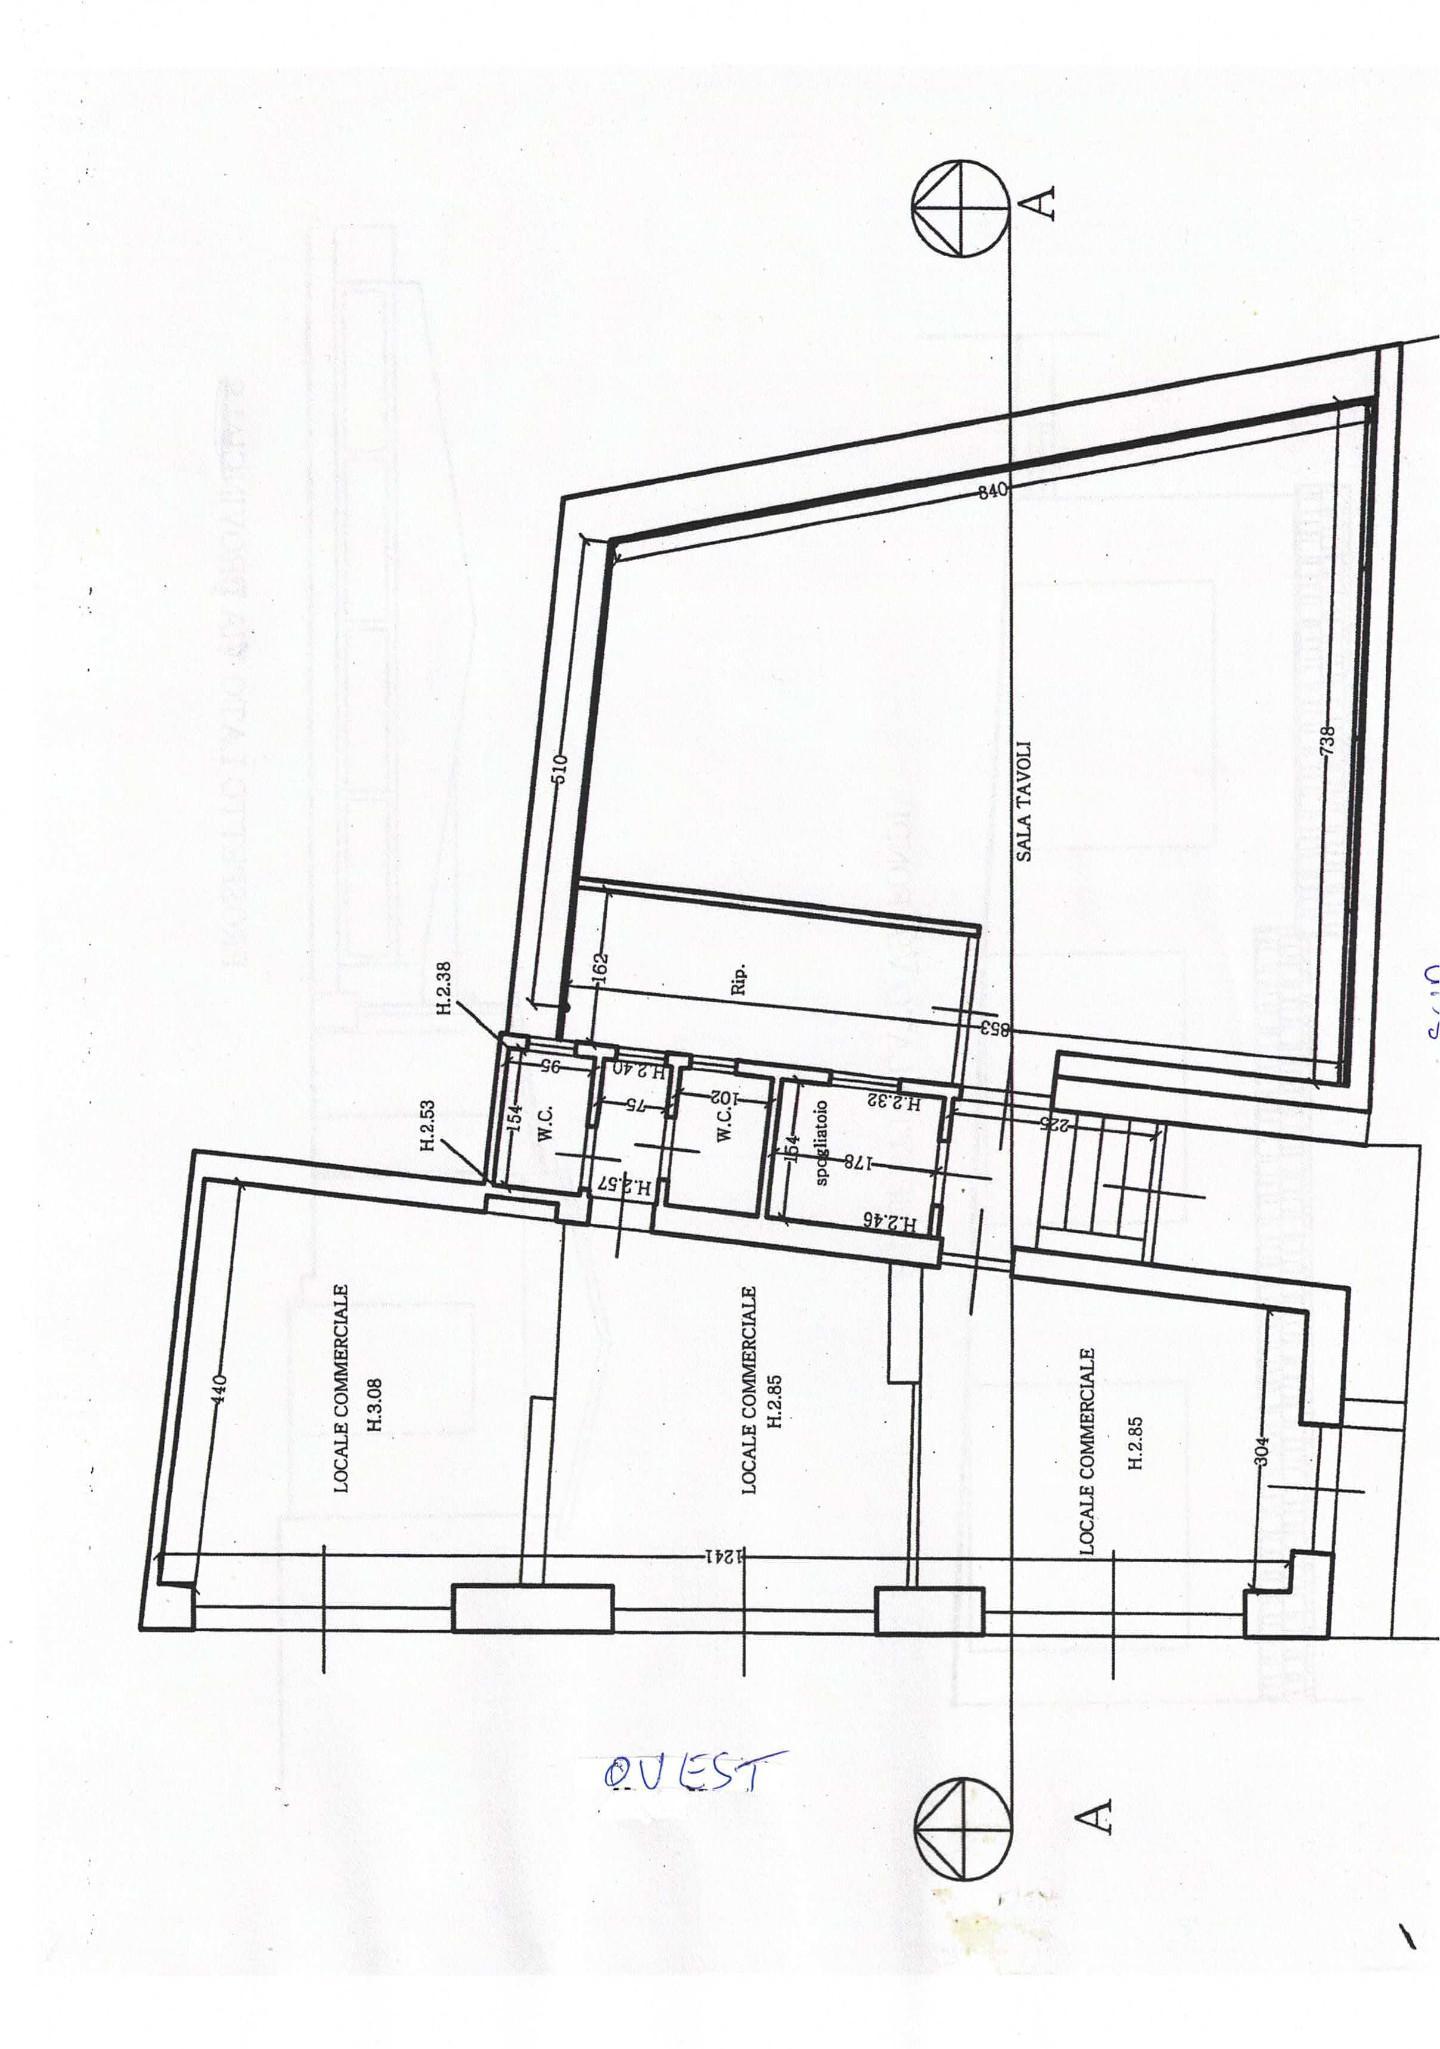 Locale comm.le/Fondo in vendita - Camaiore